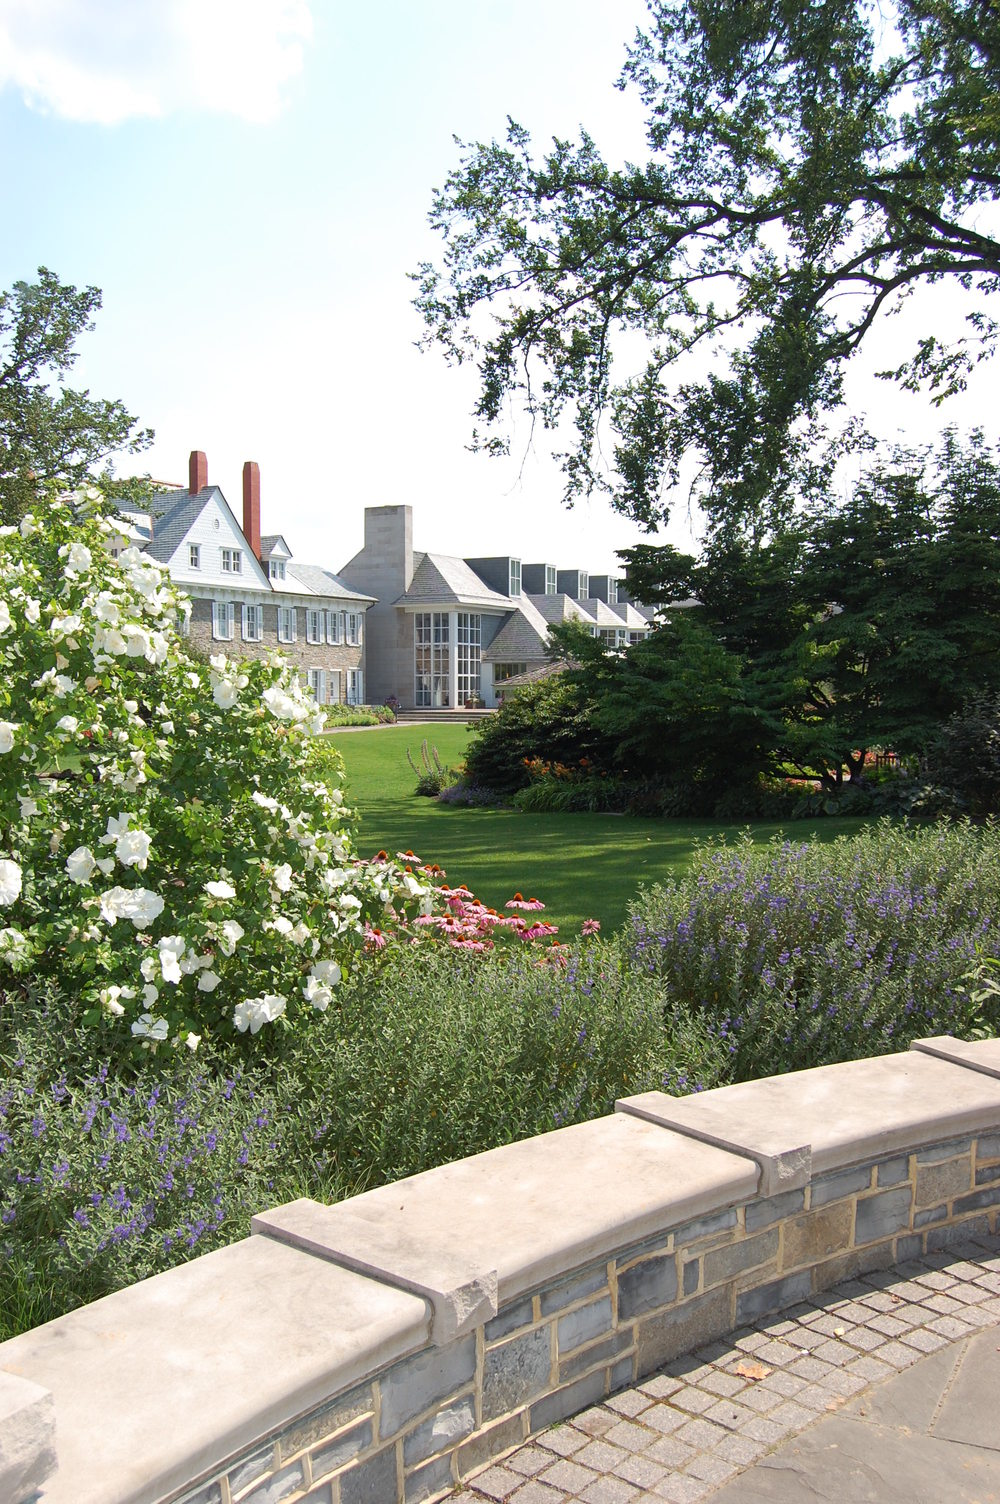 penn state hintz family alumni center design john morgan thomas landscape architects